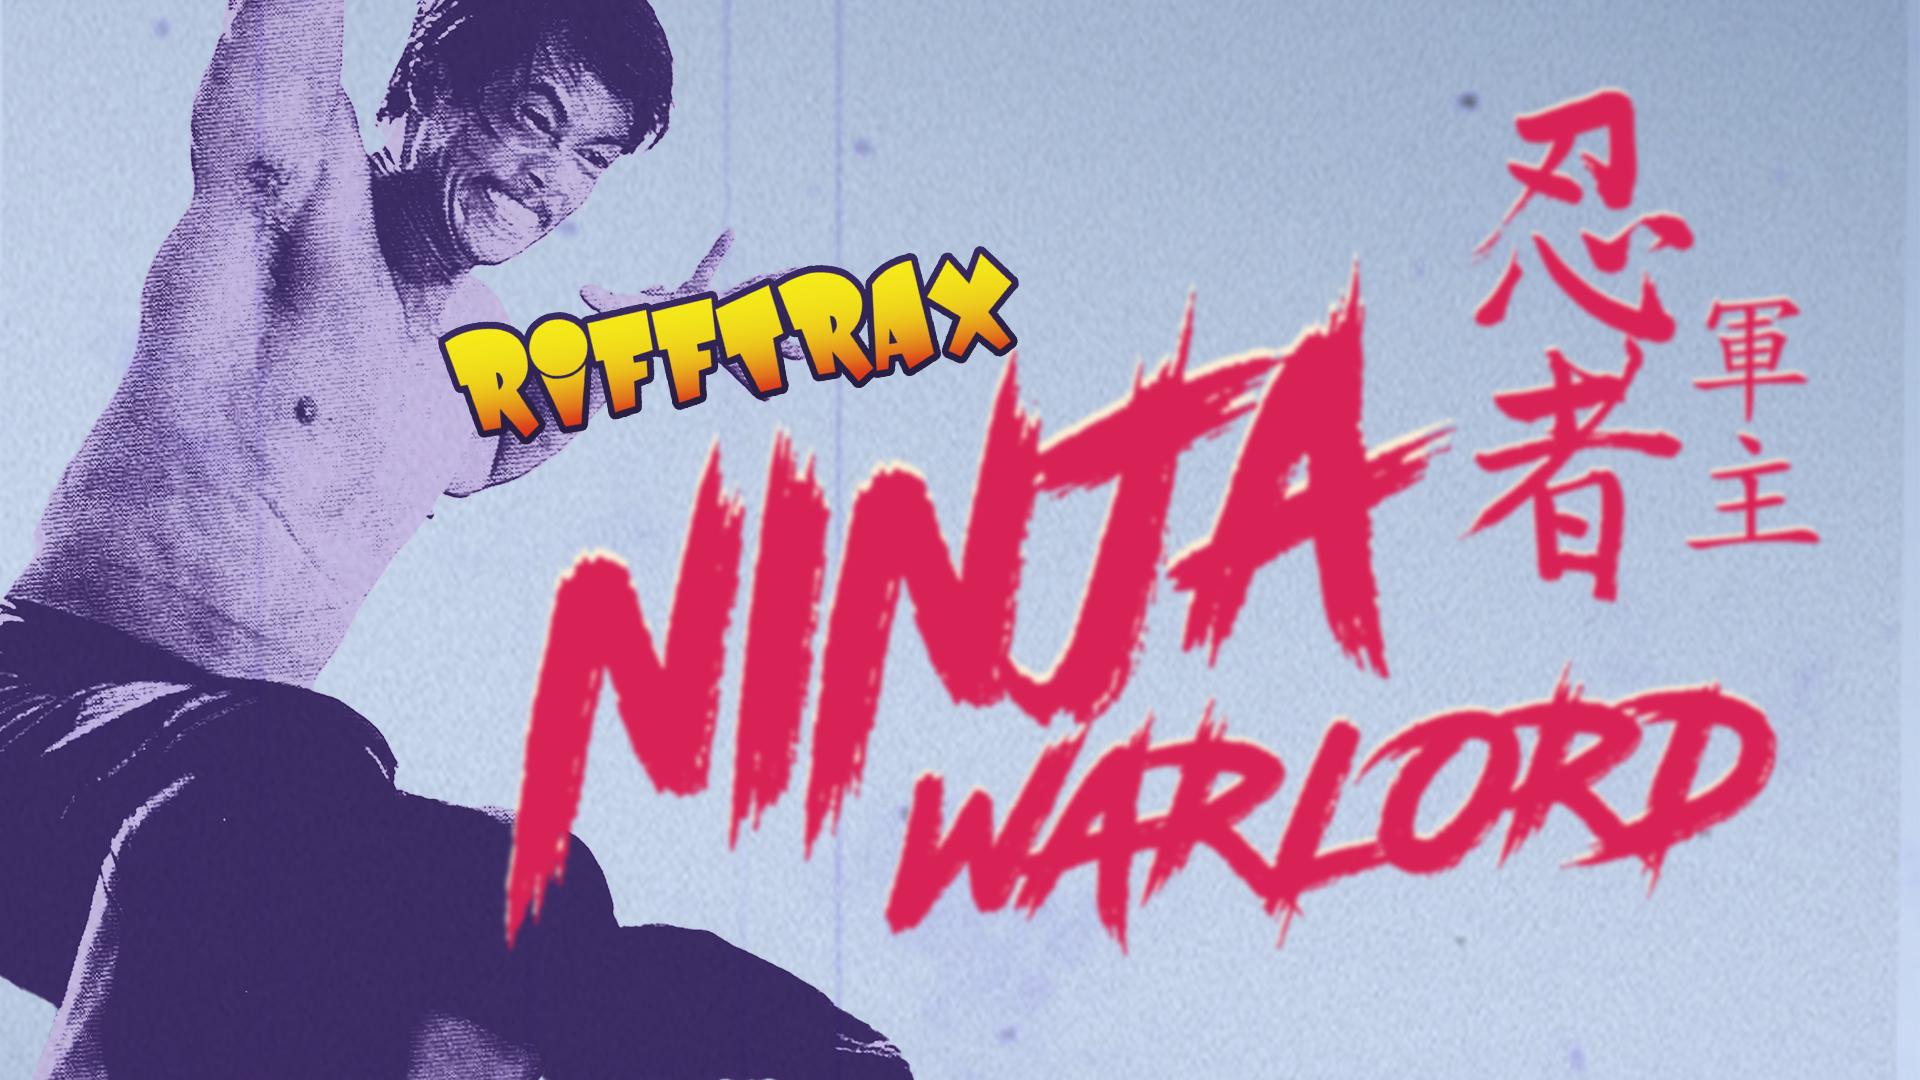 RiffTrax: Ninja Warlord